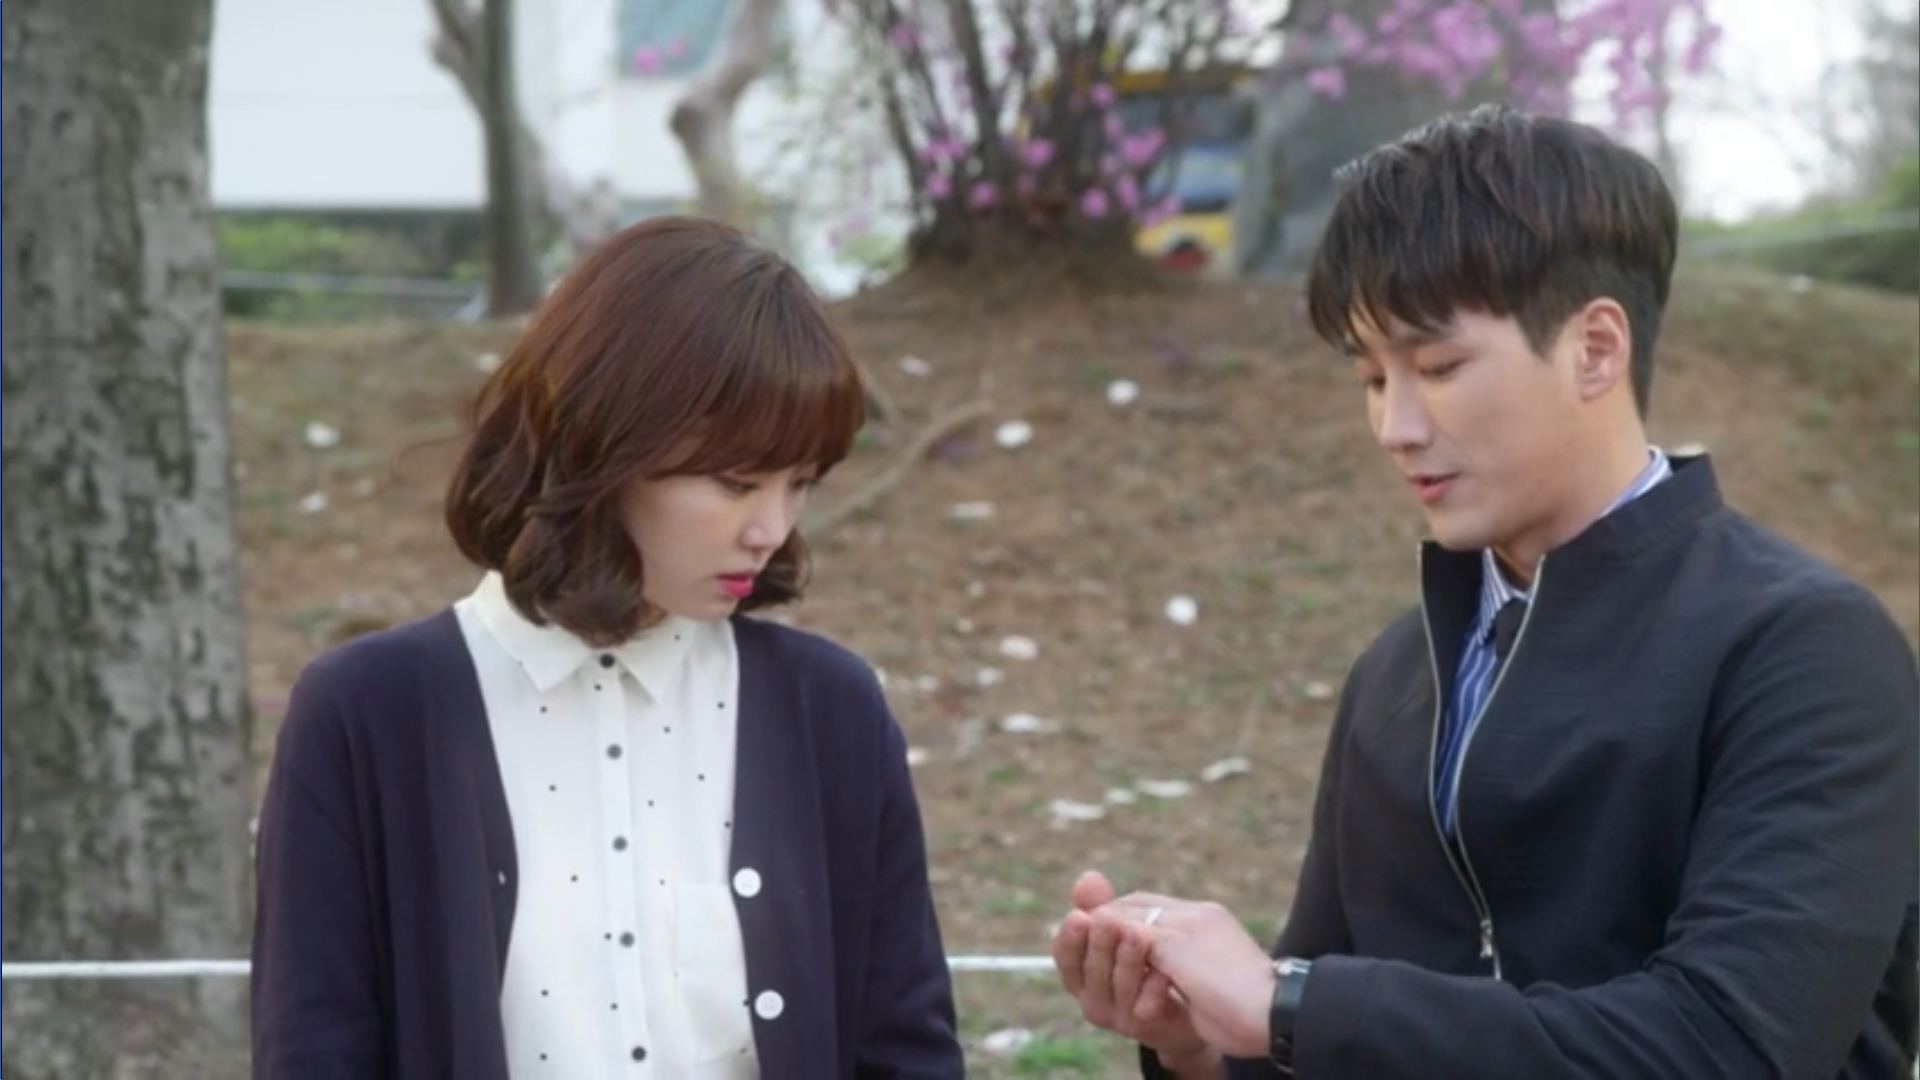 Wednesday 3:30 PM Baek Seung-gyu giving Seon Eun-woo ring back and starting over